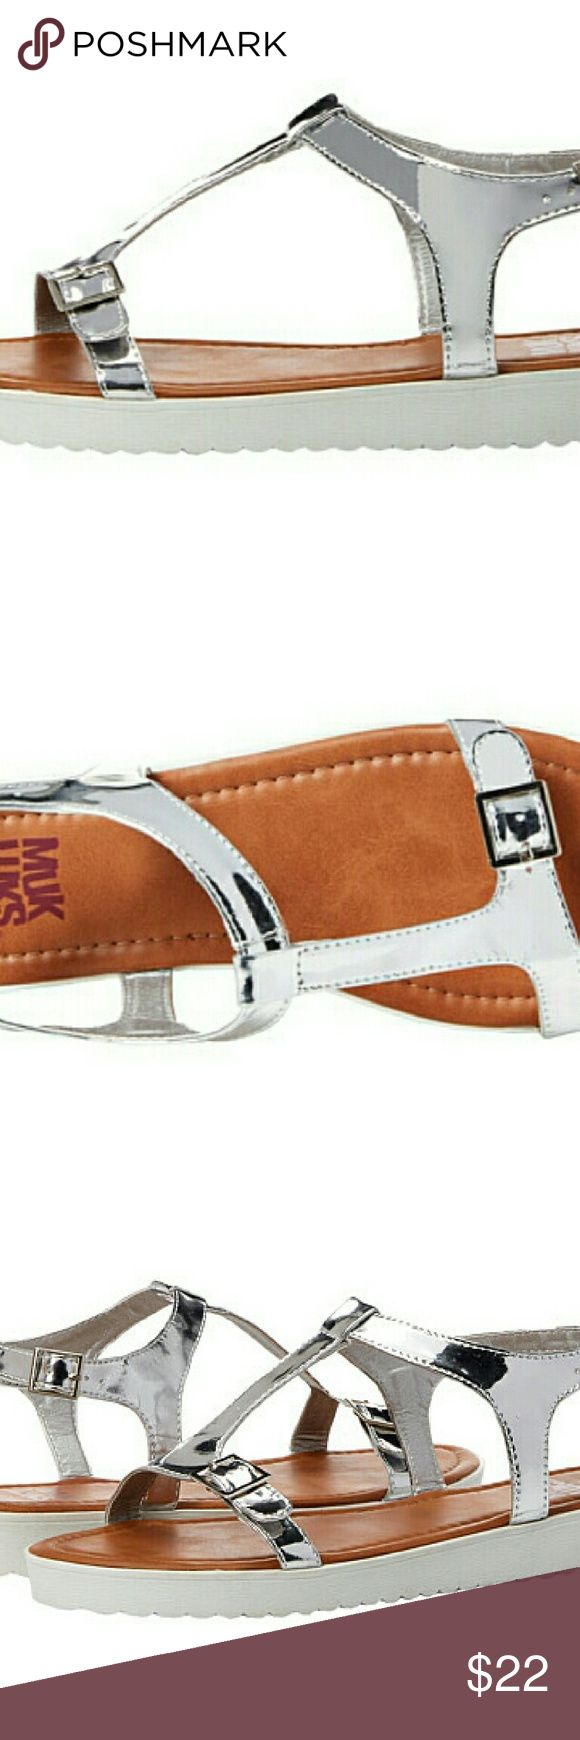 Muk luks silver flat sandals Silver, metallic, trendy, brand new Muk Luks Shoes Sandals